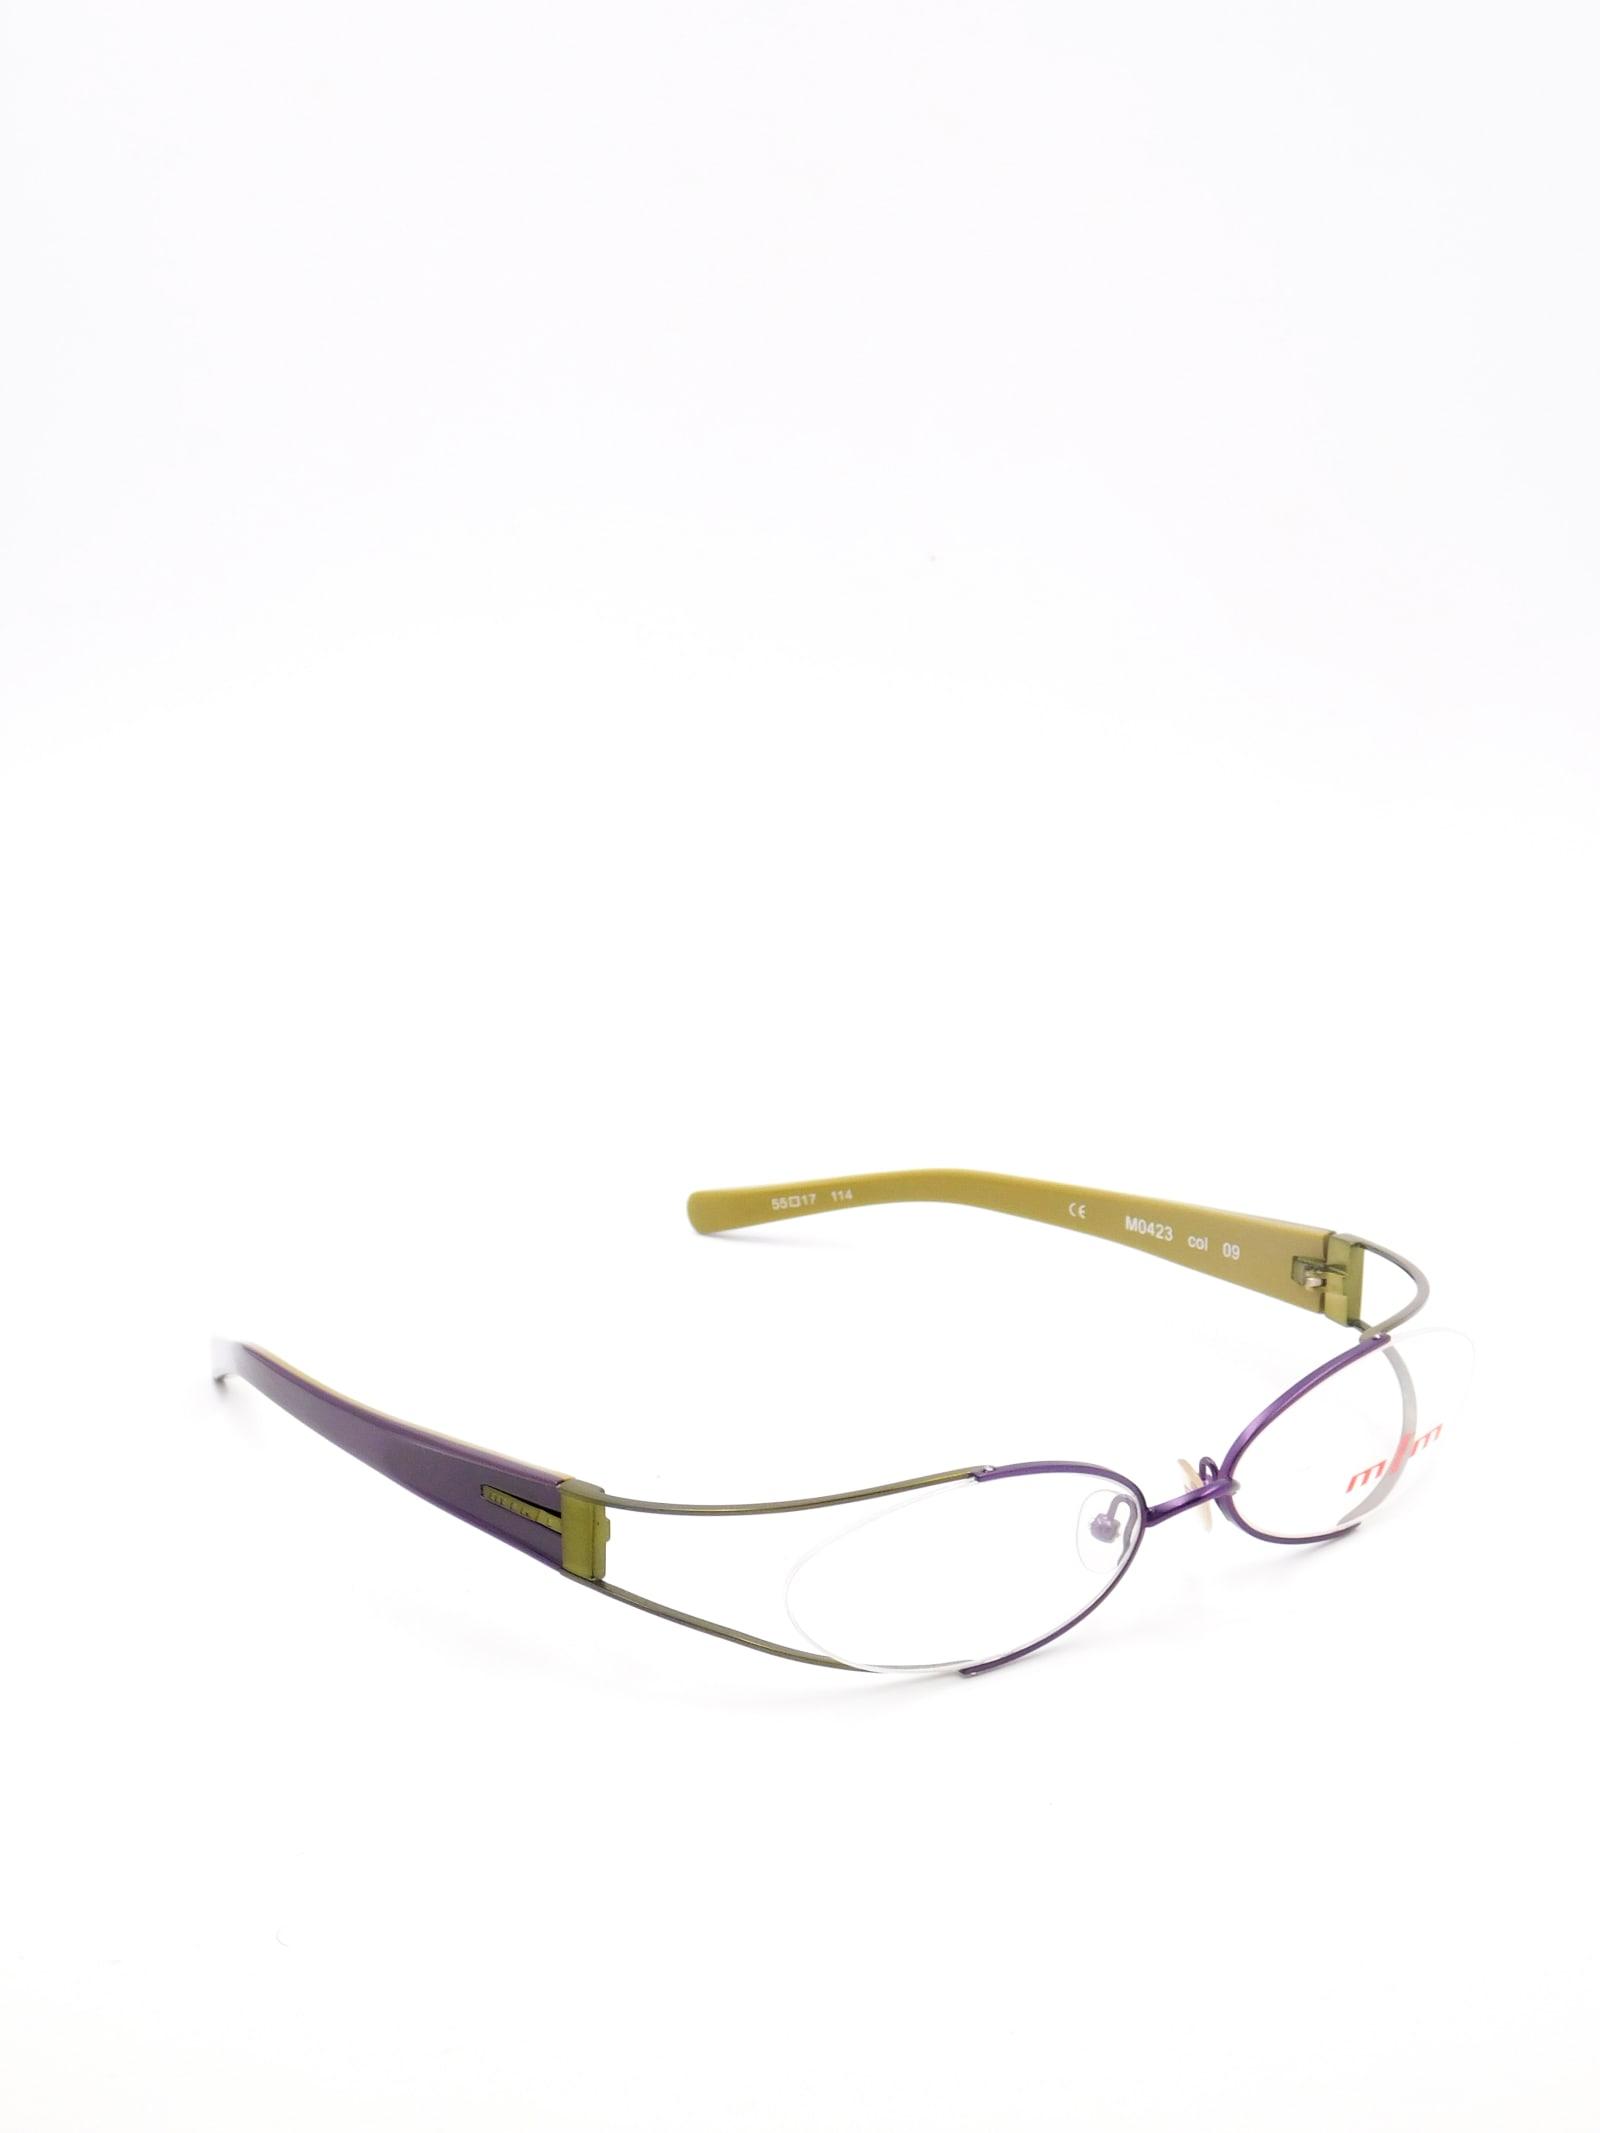 M0423 Eyewear